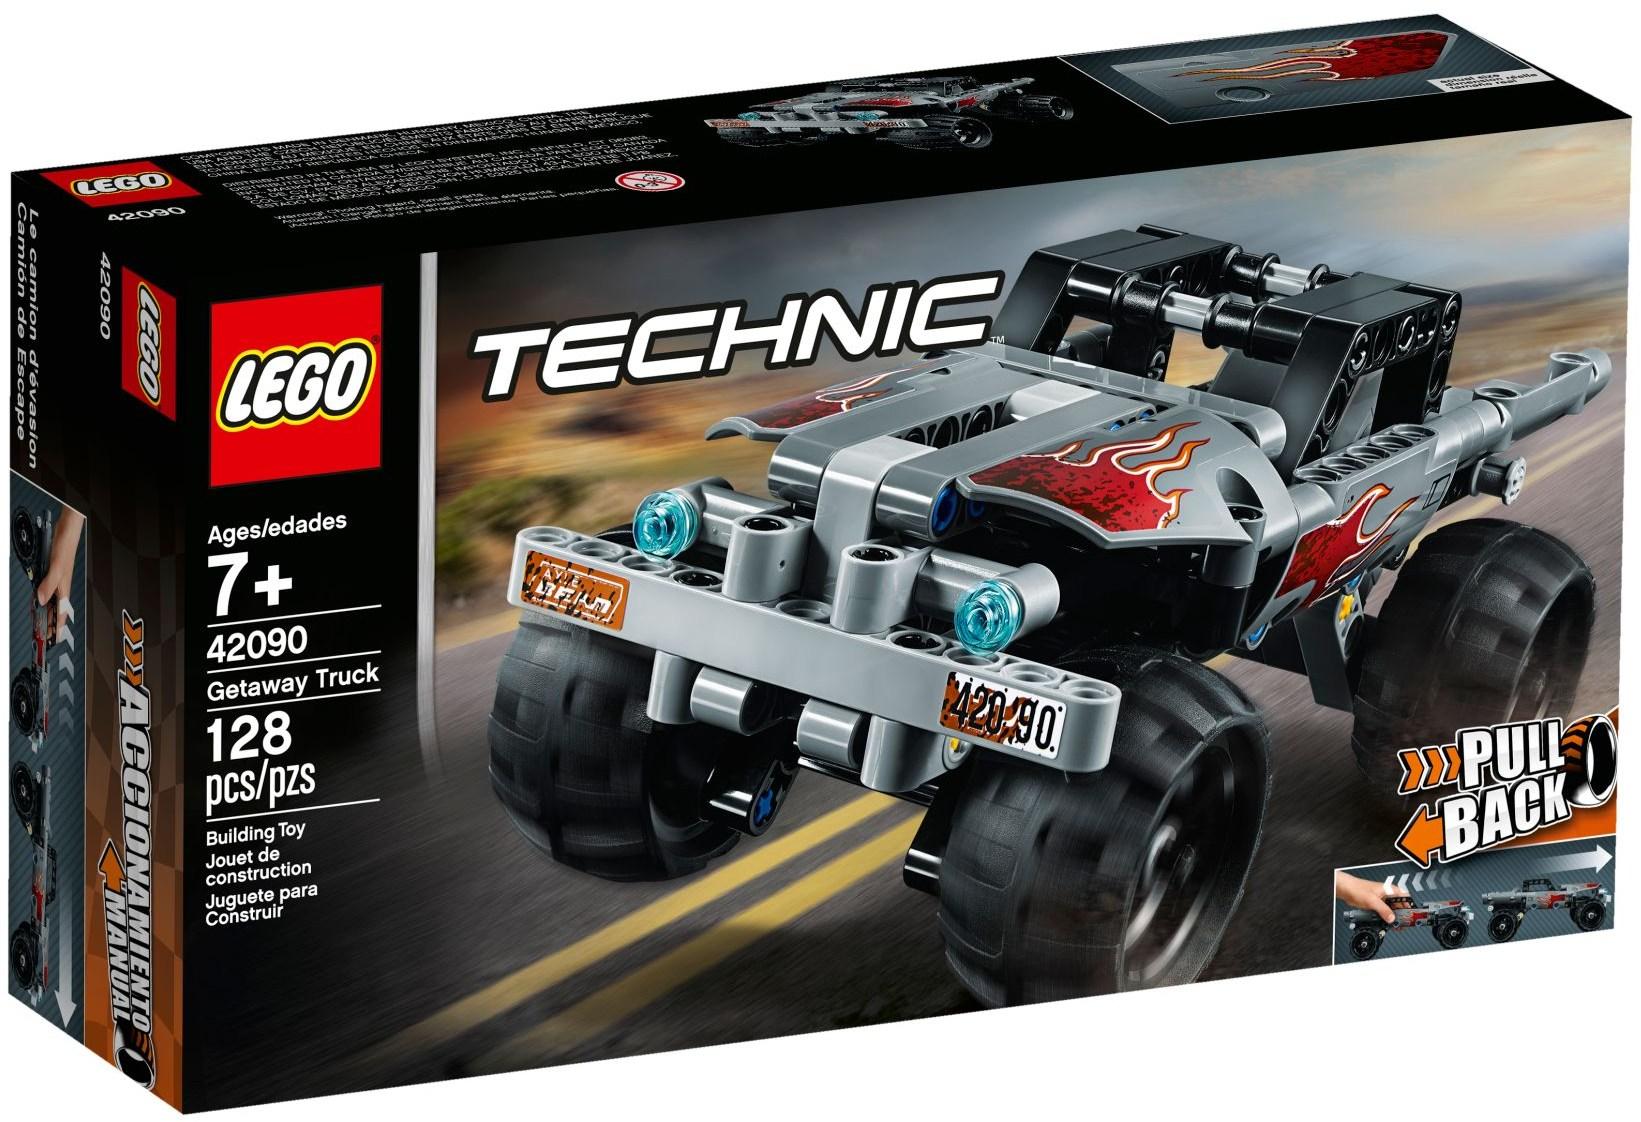 LEGO GETAWAY TRUCK - 42090